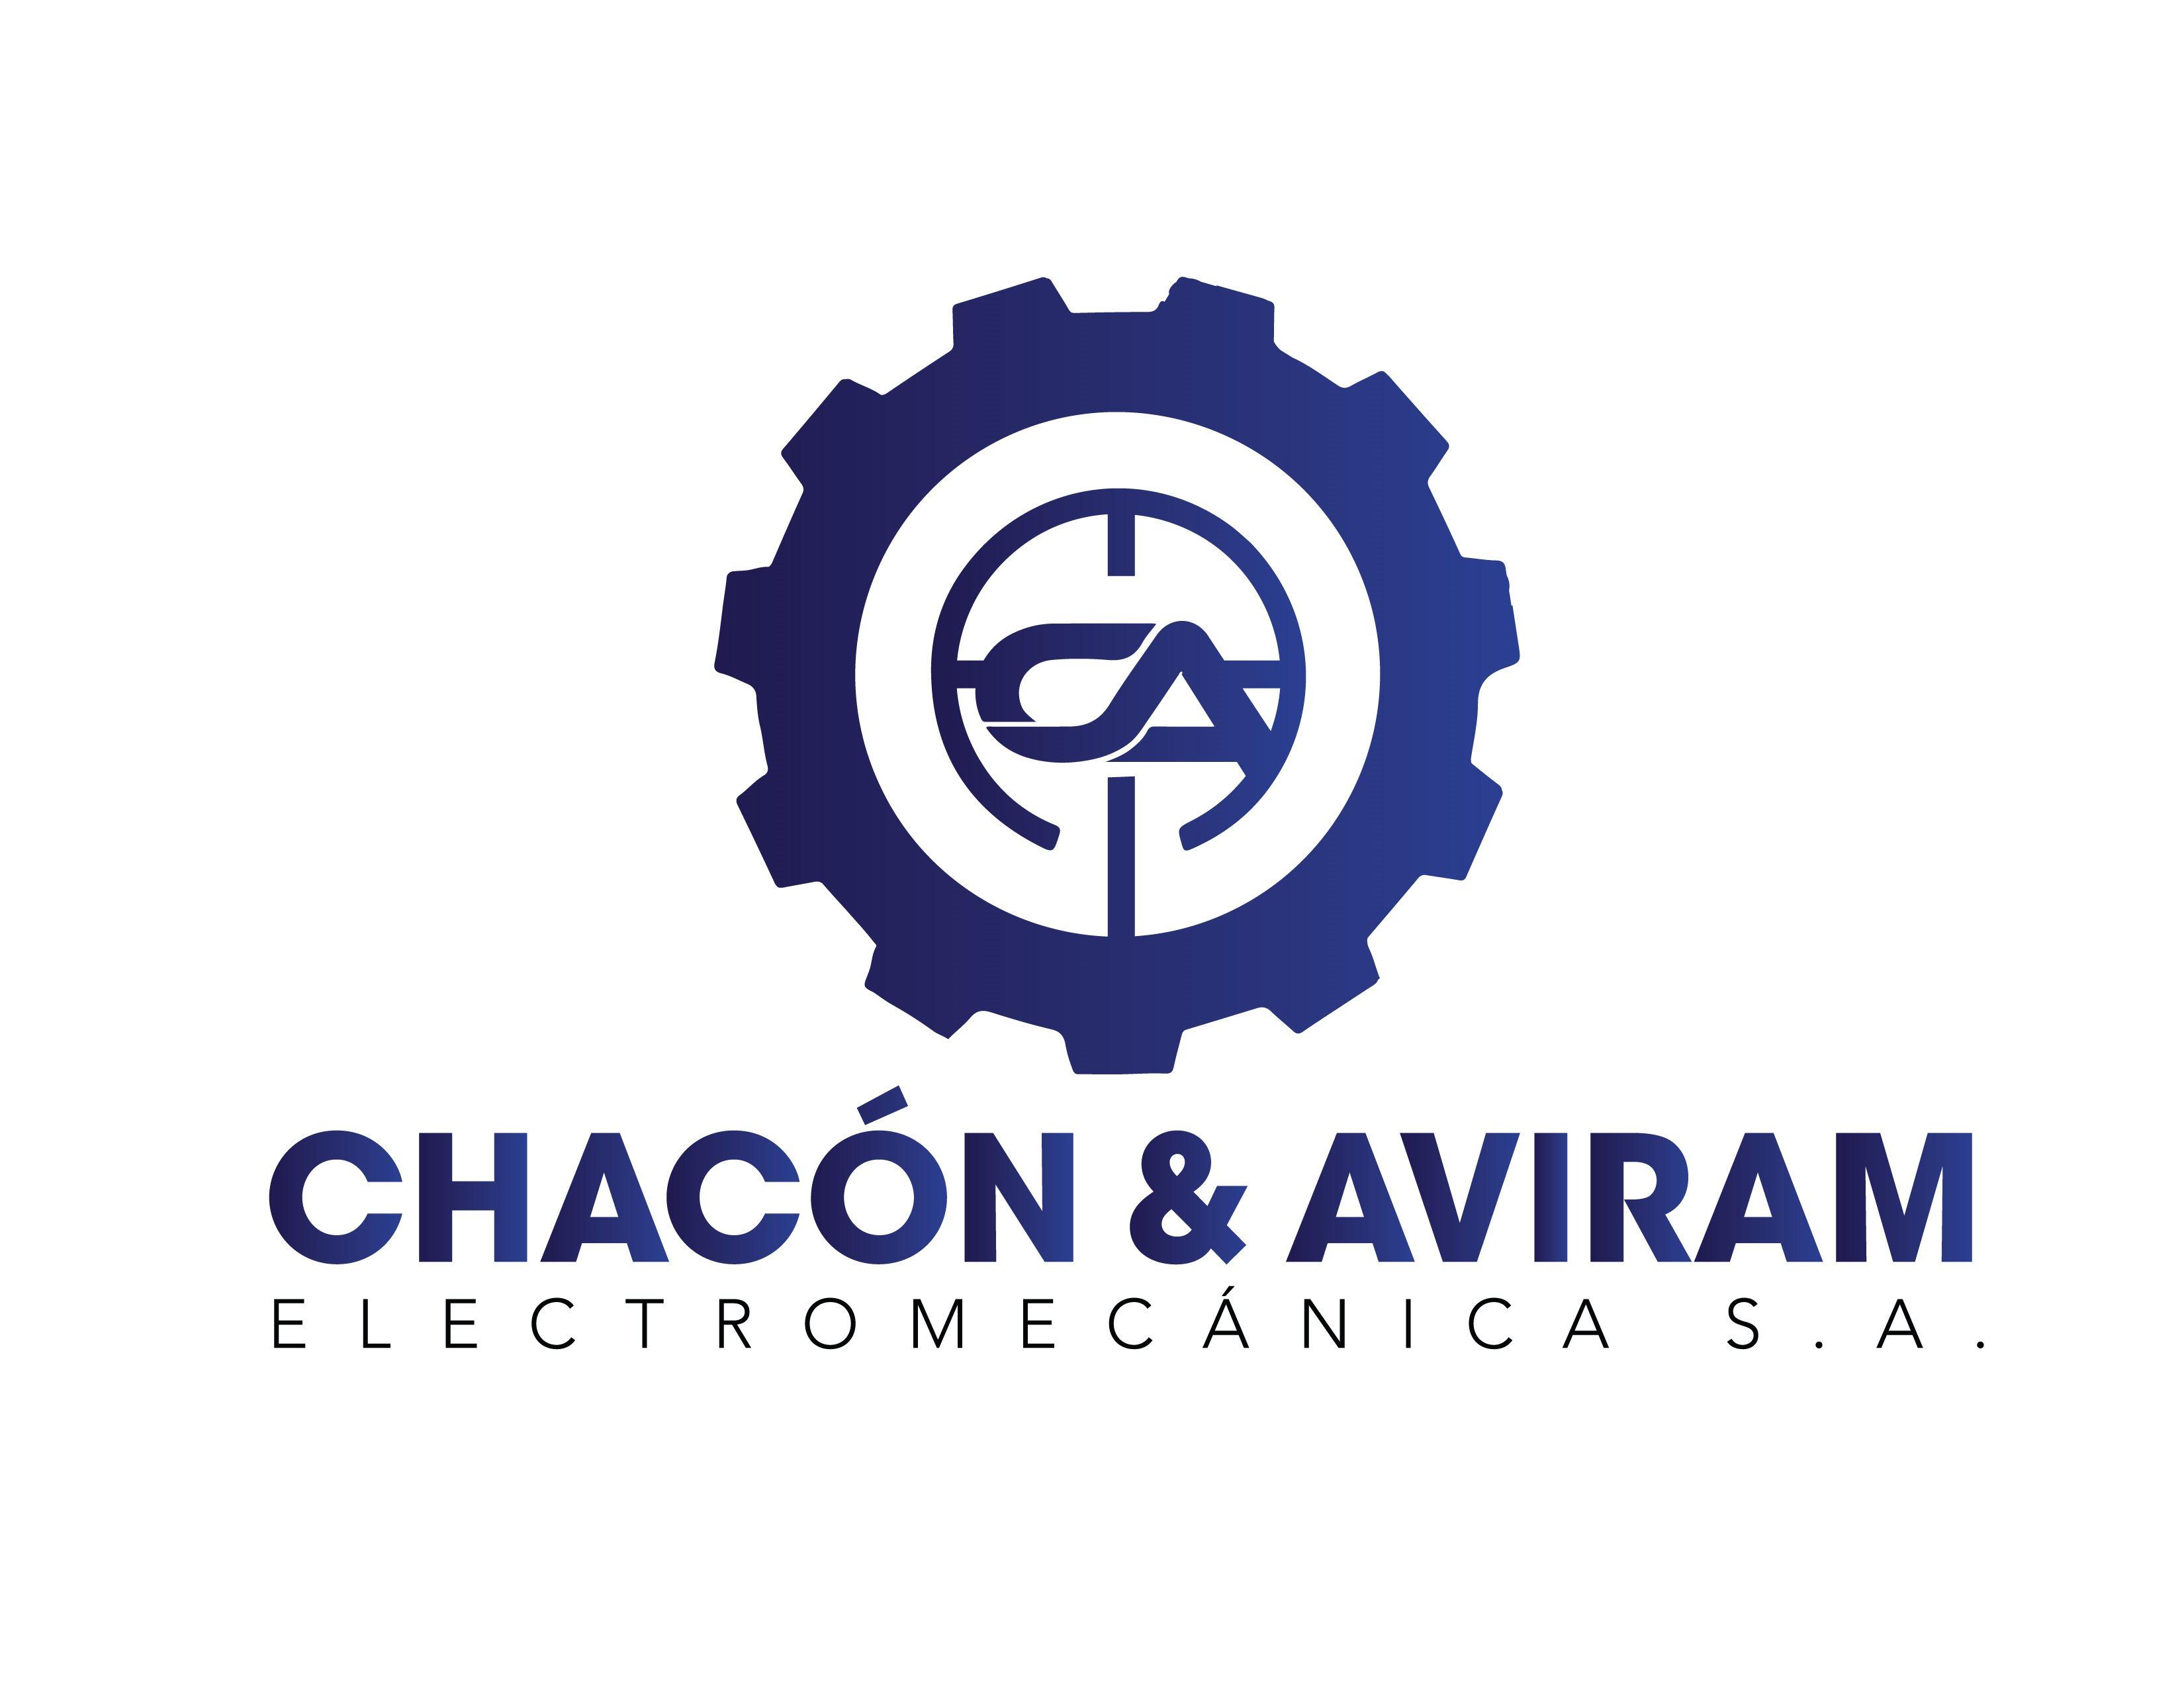 Chacon&Aviram Electromecanica S.A.